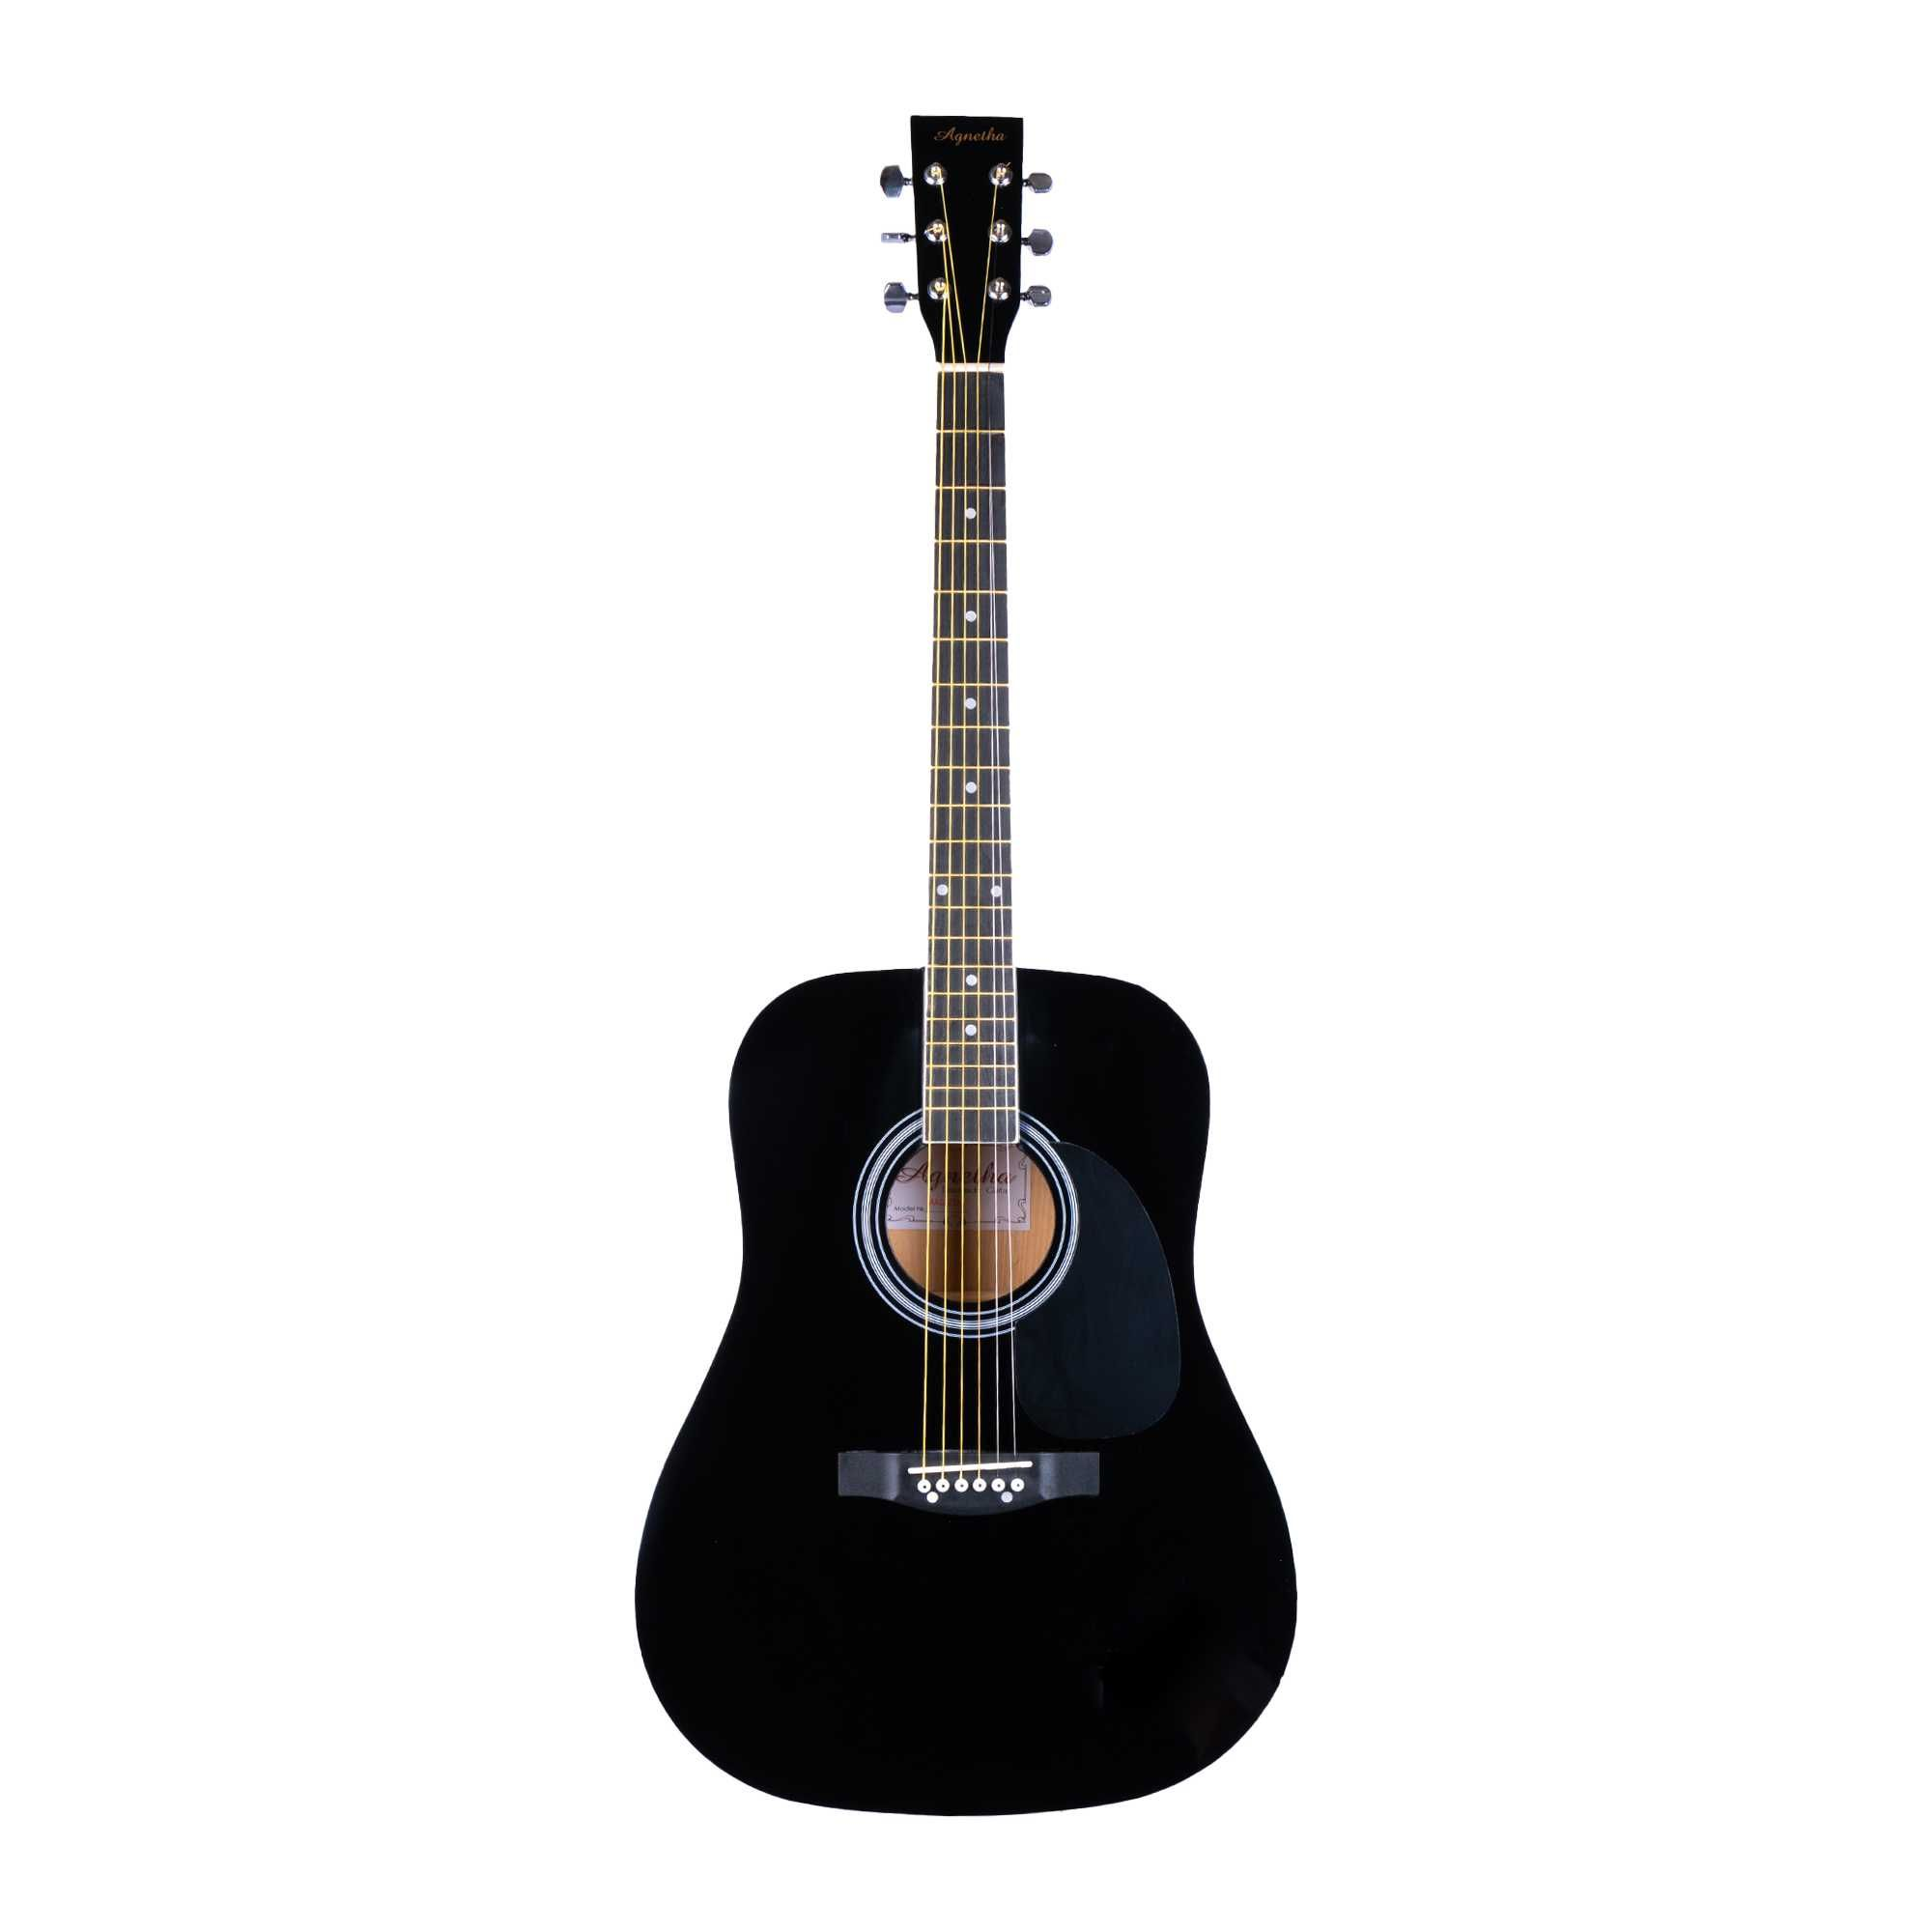 Гитара Agnetha c чехлом